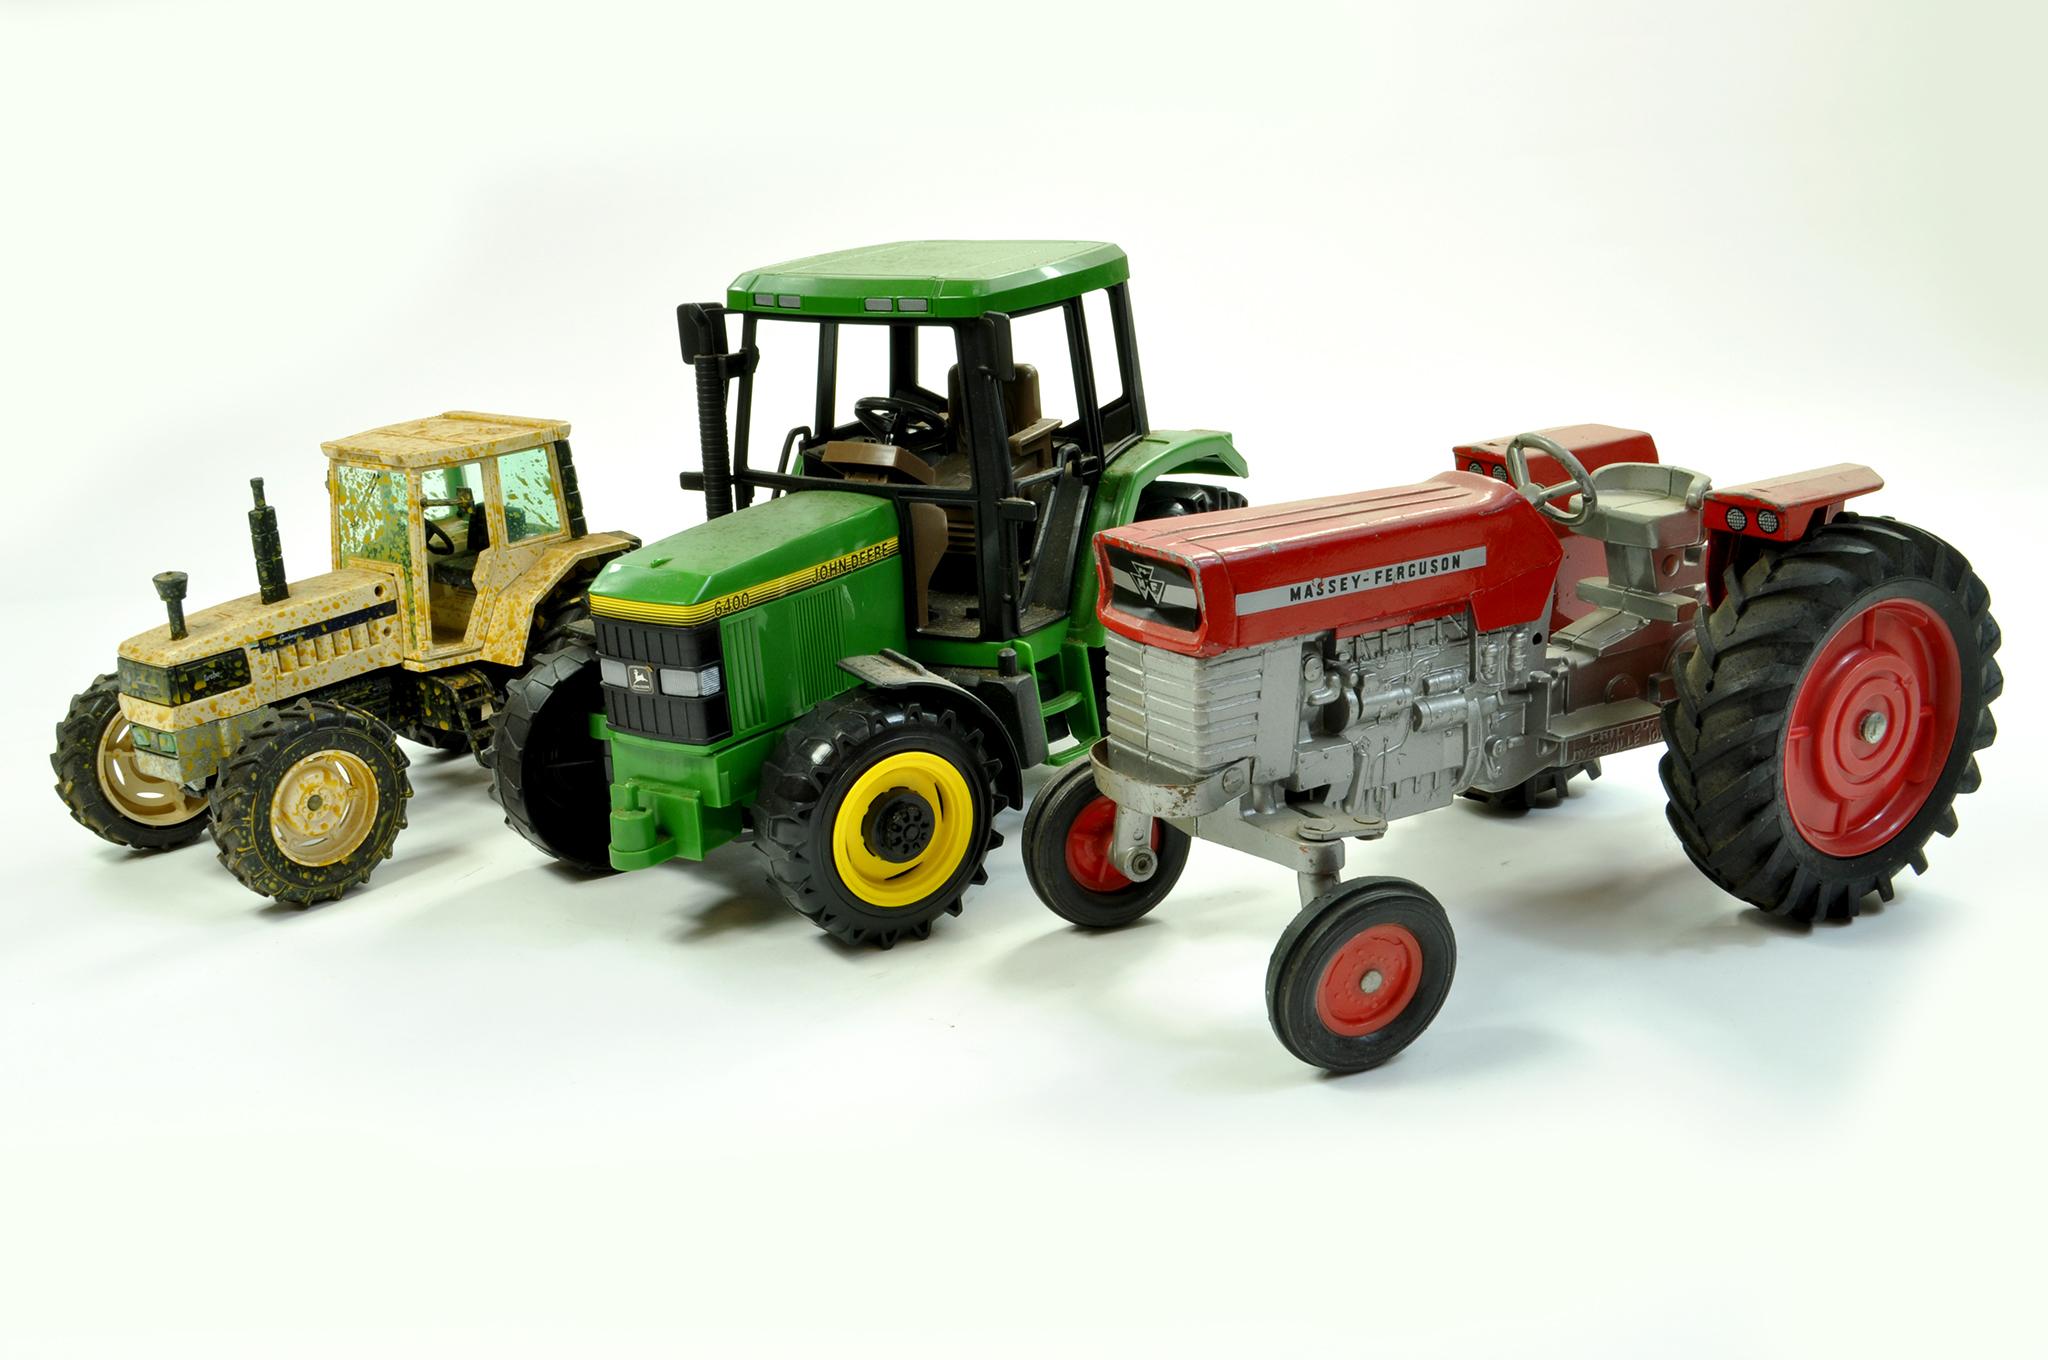 Lot 45 - Tractor Trio comprising Ertl Massey Ferguson Vintage issue plus Bruder John Deere 6400 and ROS